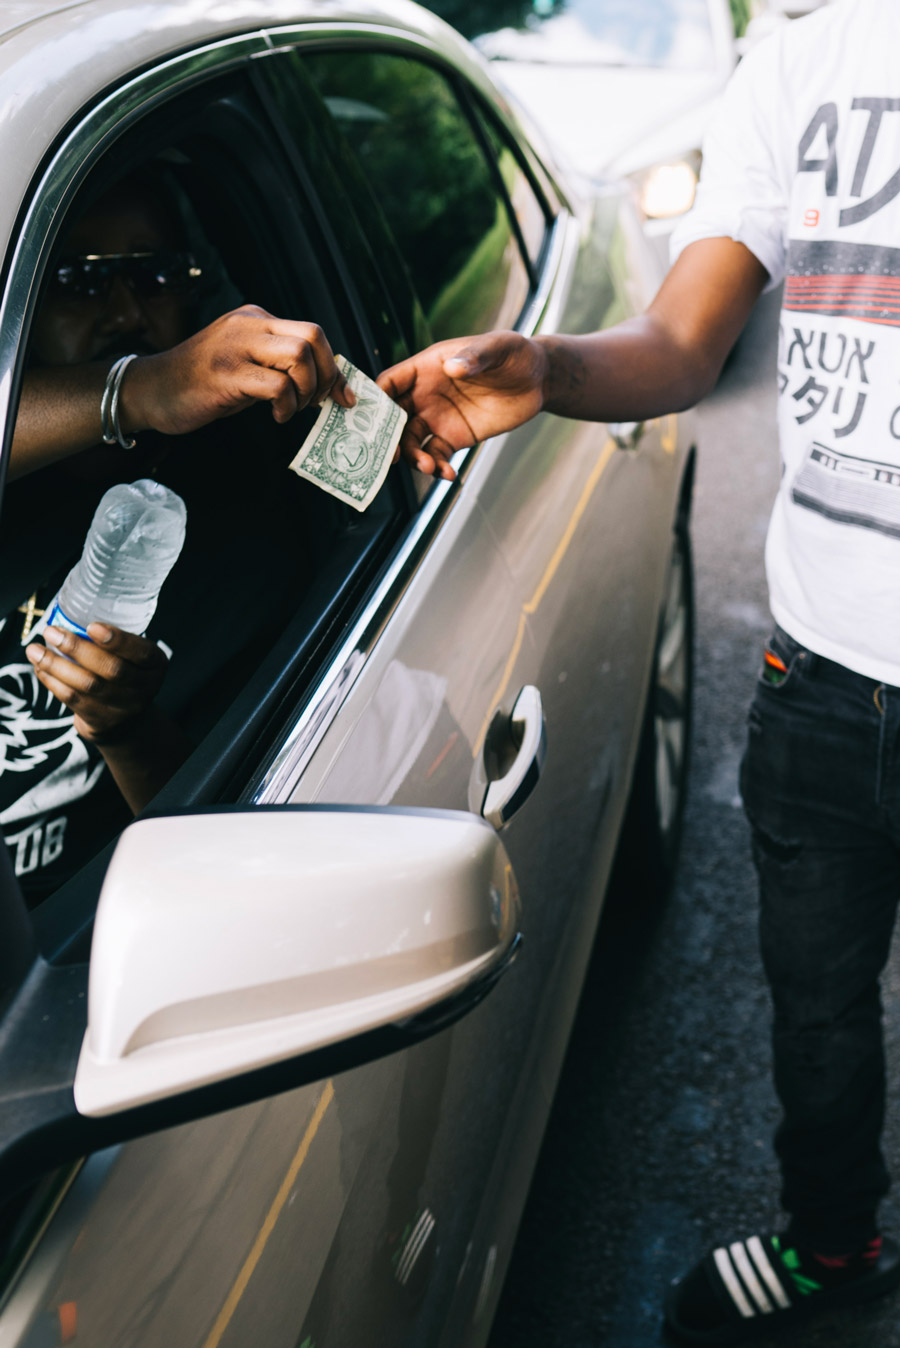 The water boy's hustle Atlanta